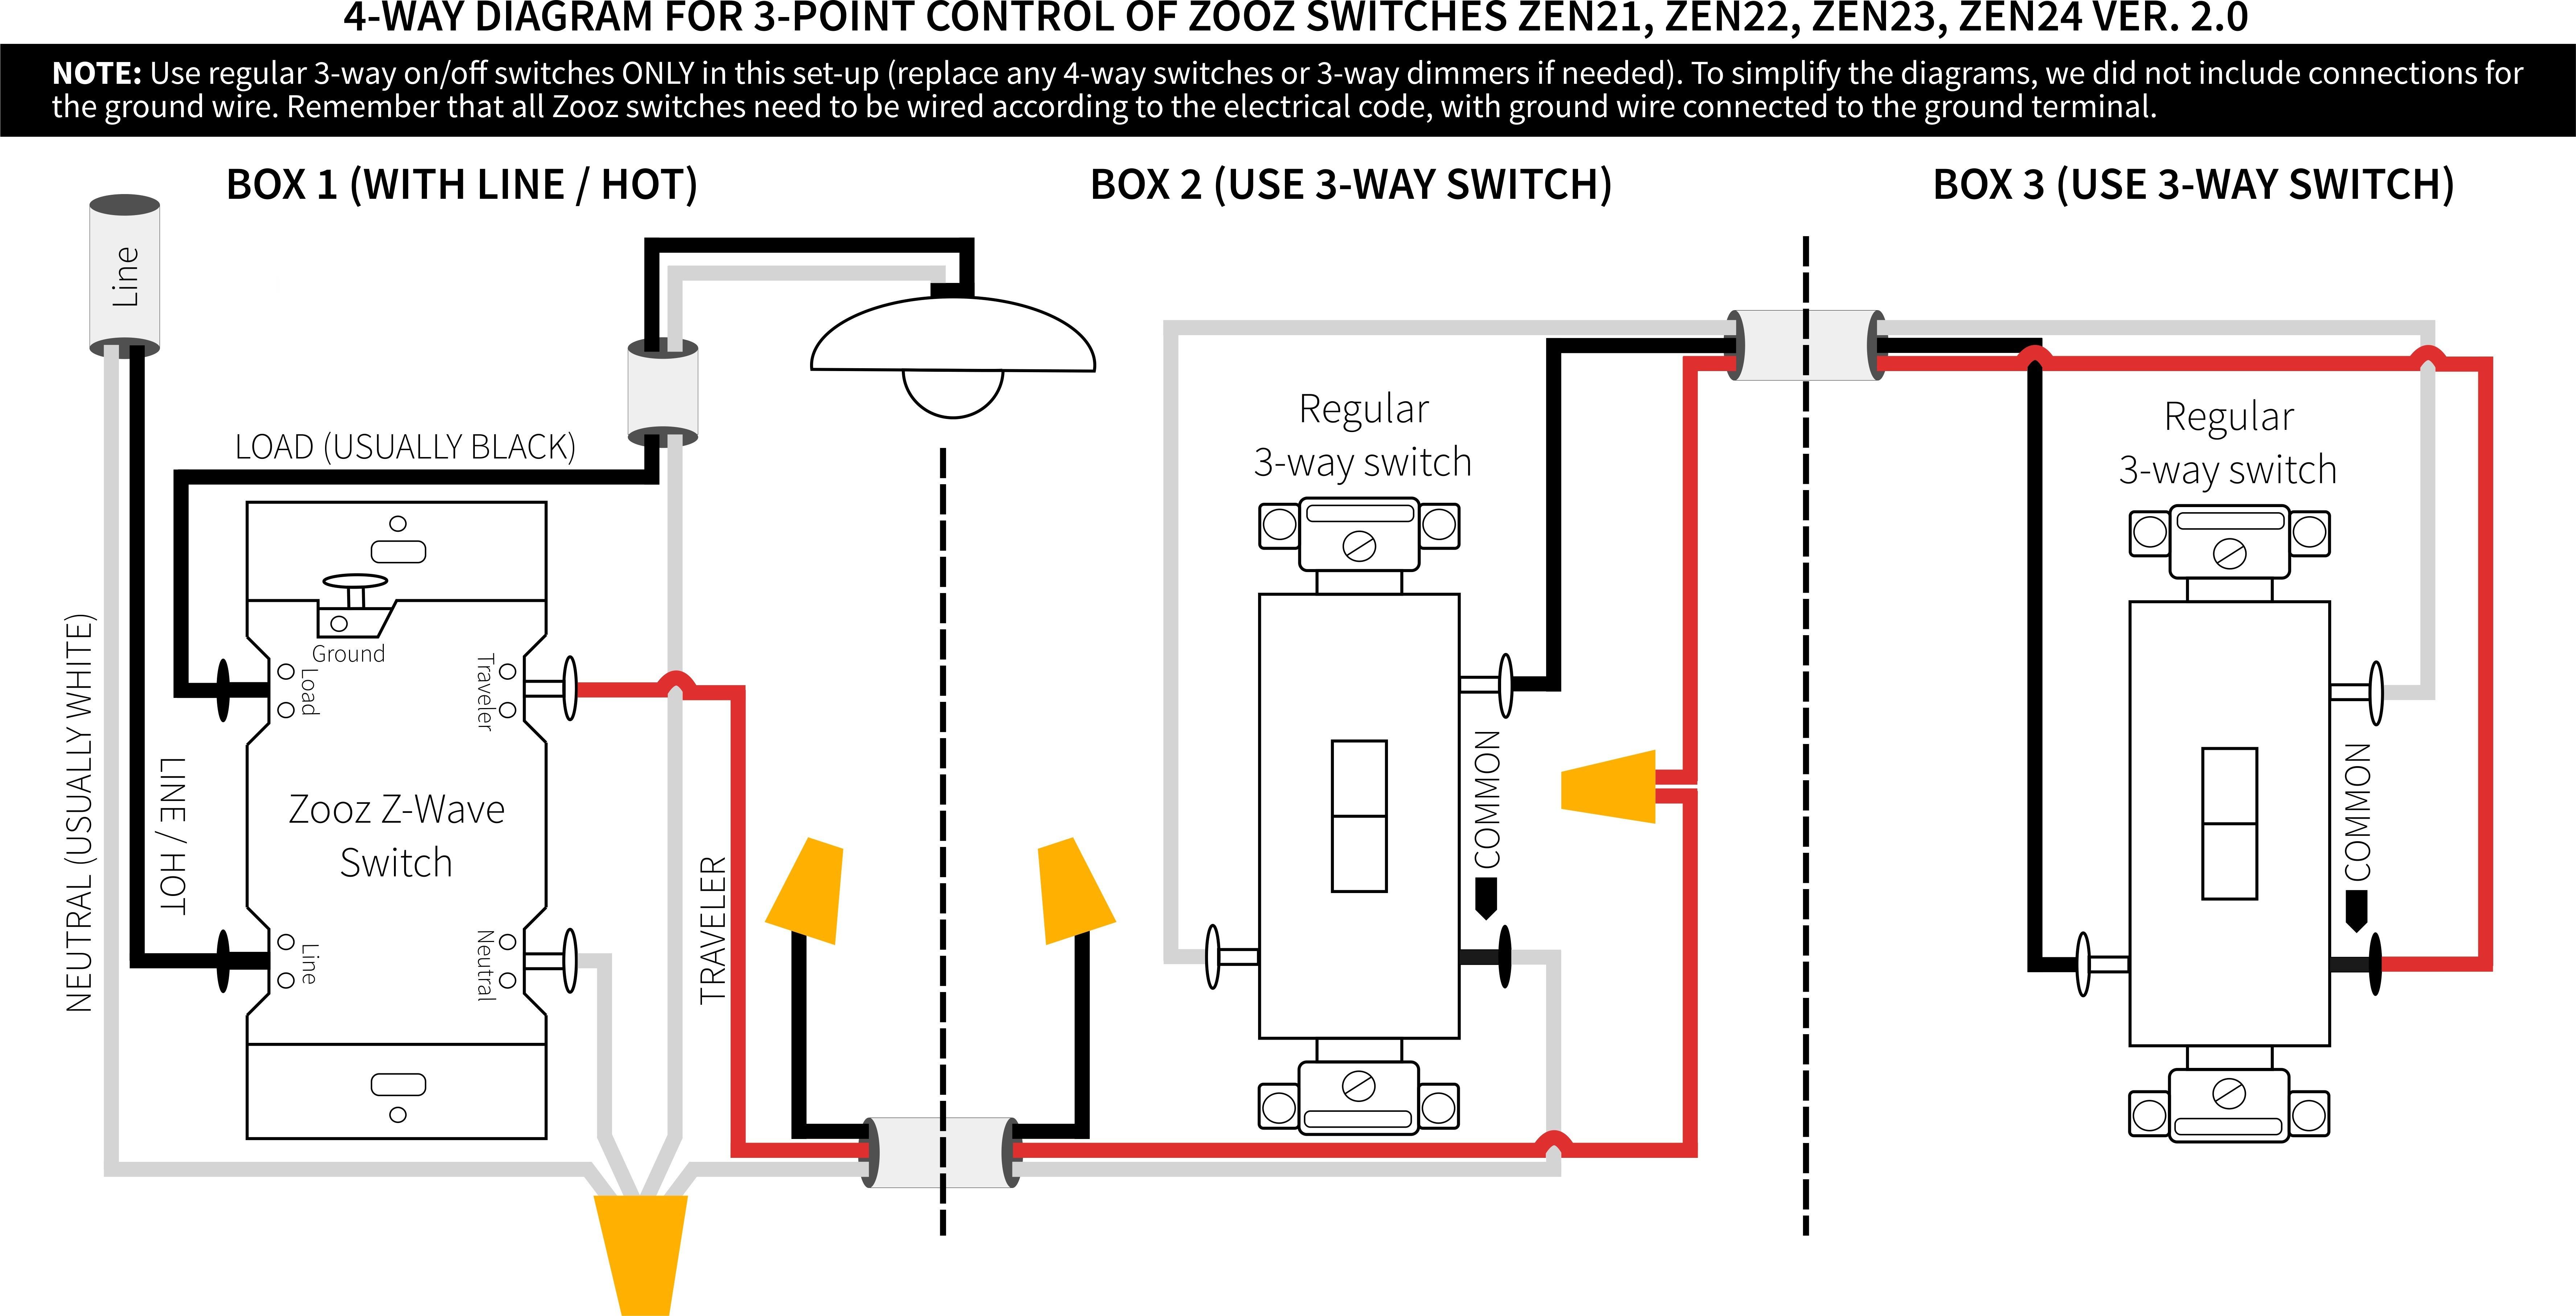 [DIAGRAM_5UK]  DW_9838] Leviton T5225 Wiring Diagram Switch Download Diagram   Leviton T5225 Wiring Diagram Switch      Orsal Phot Denli Mohammedshrine Librar Wiring 101